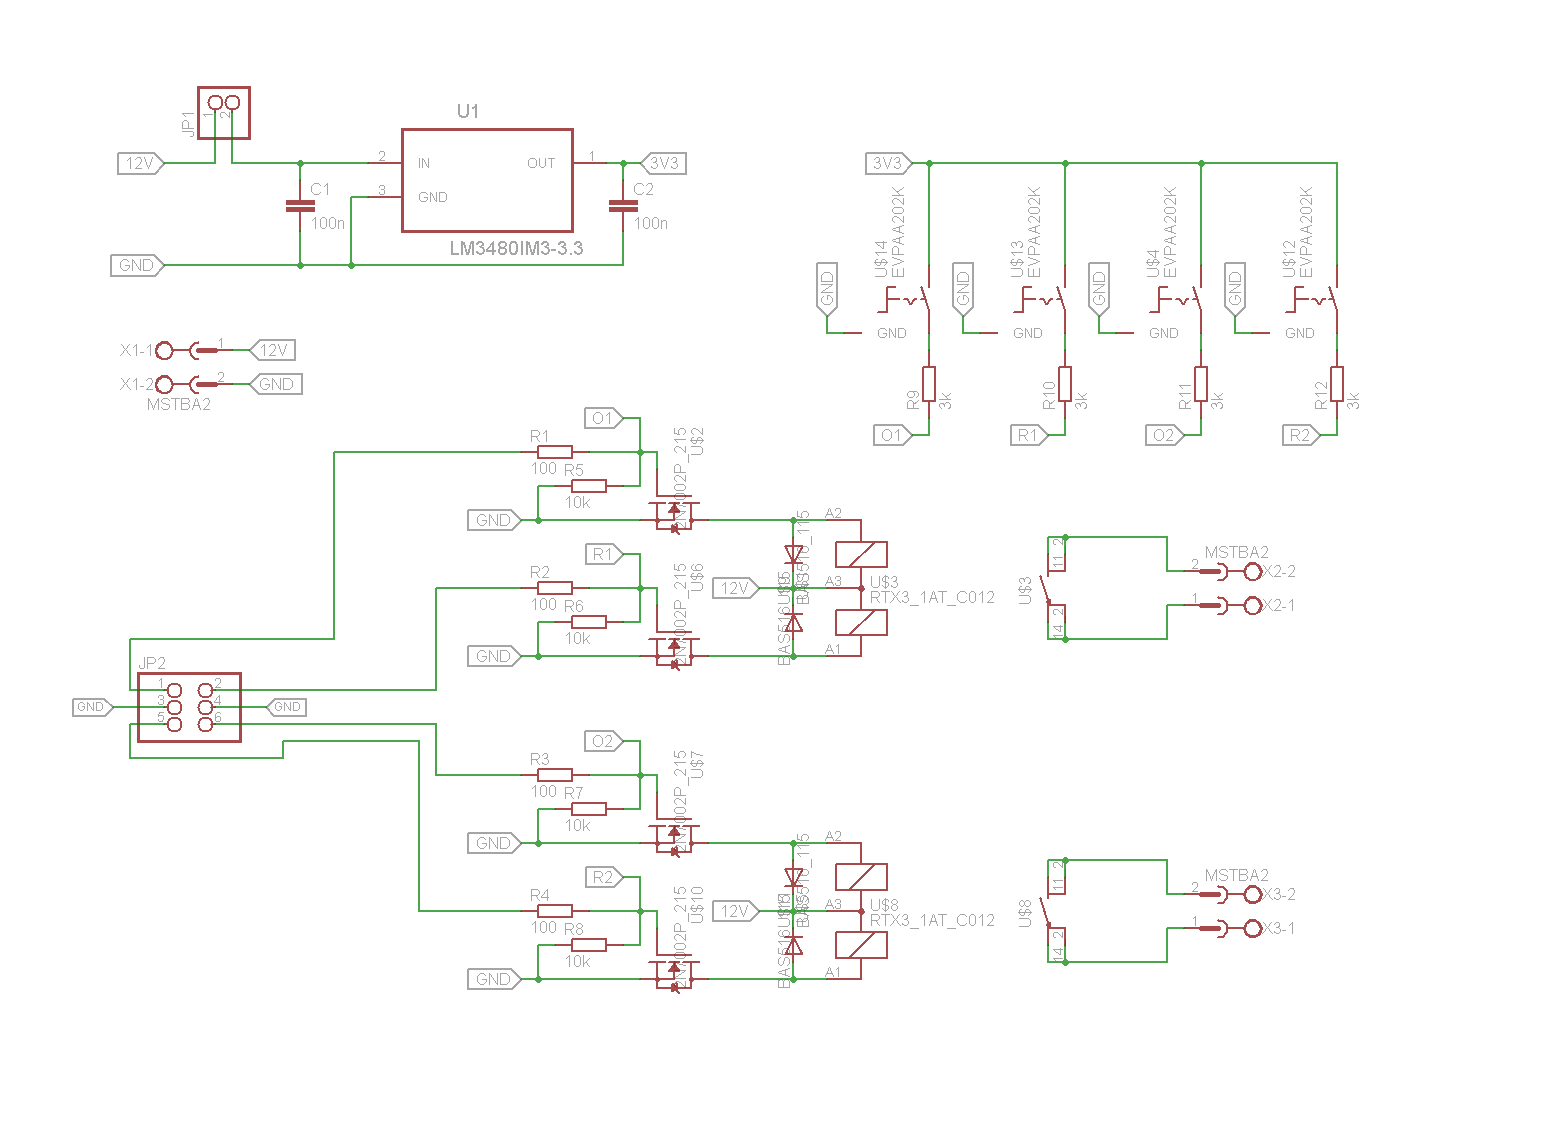 Niedlich Smartcom Relais Schaltplan Galerie - Elektrische Schaltplan ...